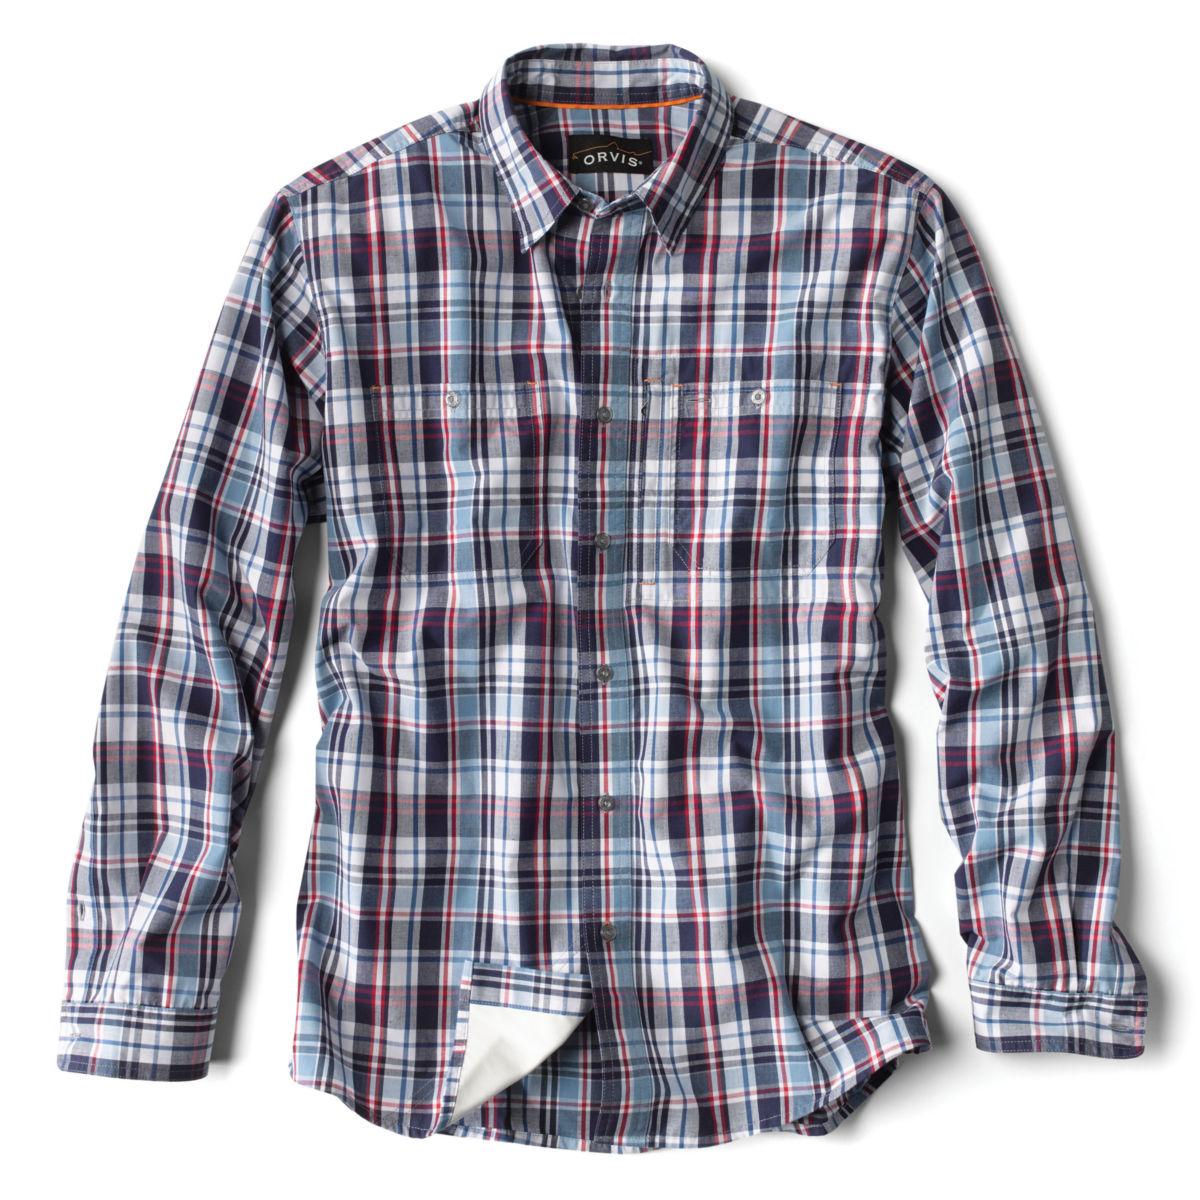 Flat Creek Plaid Shirt - R/W/B PLAIDimage number 0